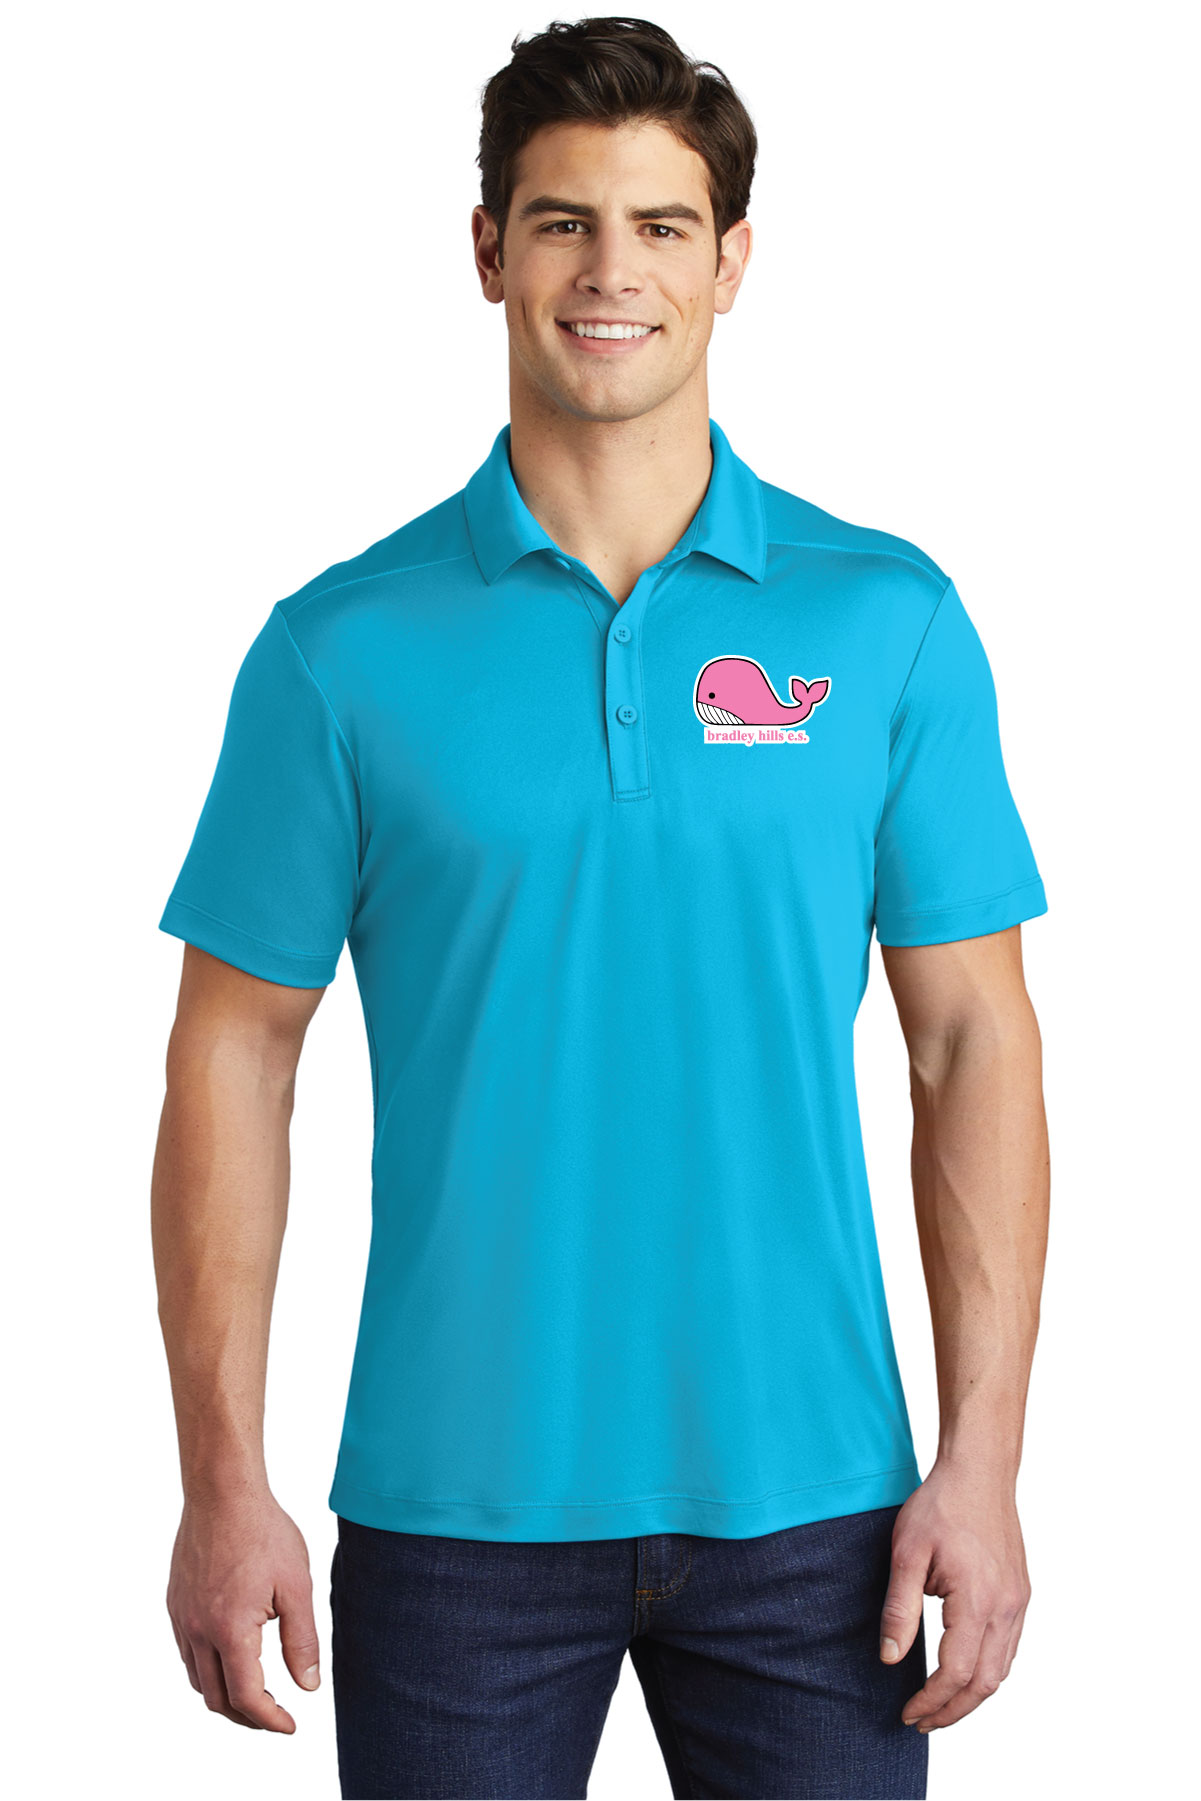 Sport-Tek ® Posi-UV Pro Polo.-Sport-Tek